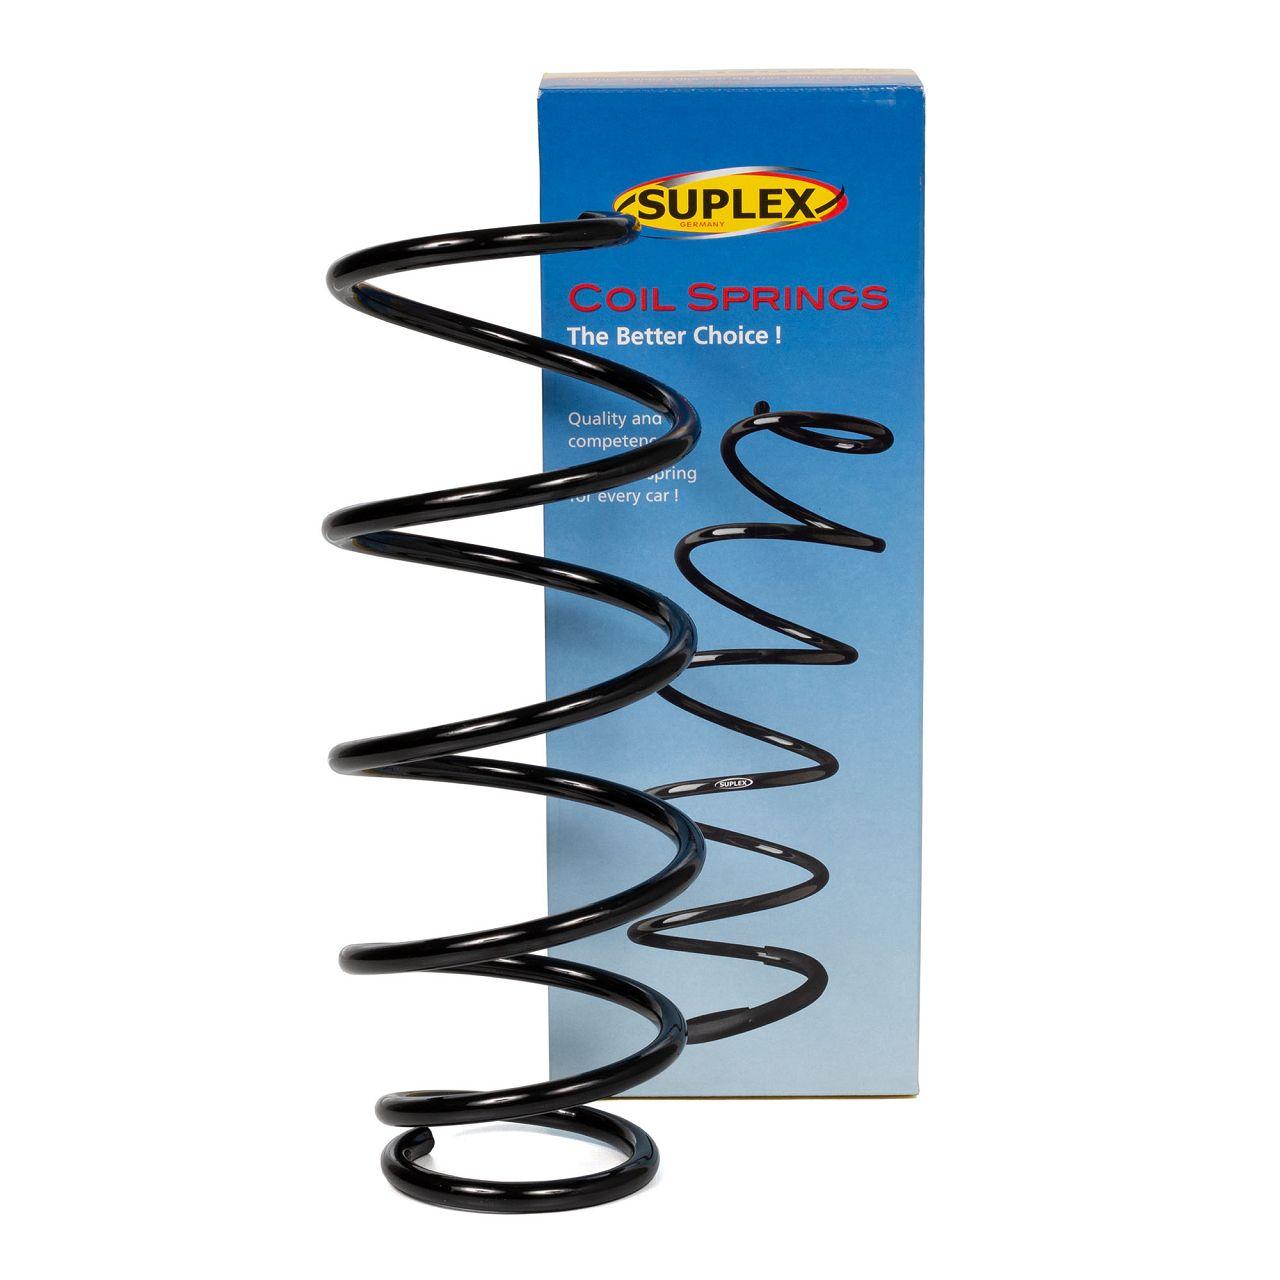 SUPLEX Fahrwerksfeder TOYOTA Yaris Liftback (_P9_) 1.0/1.3 VVt-i 69/87 PS vorne